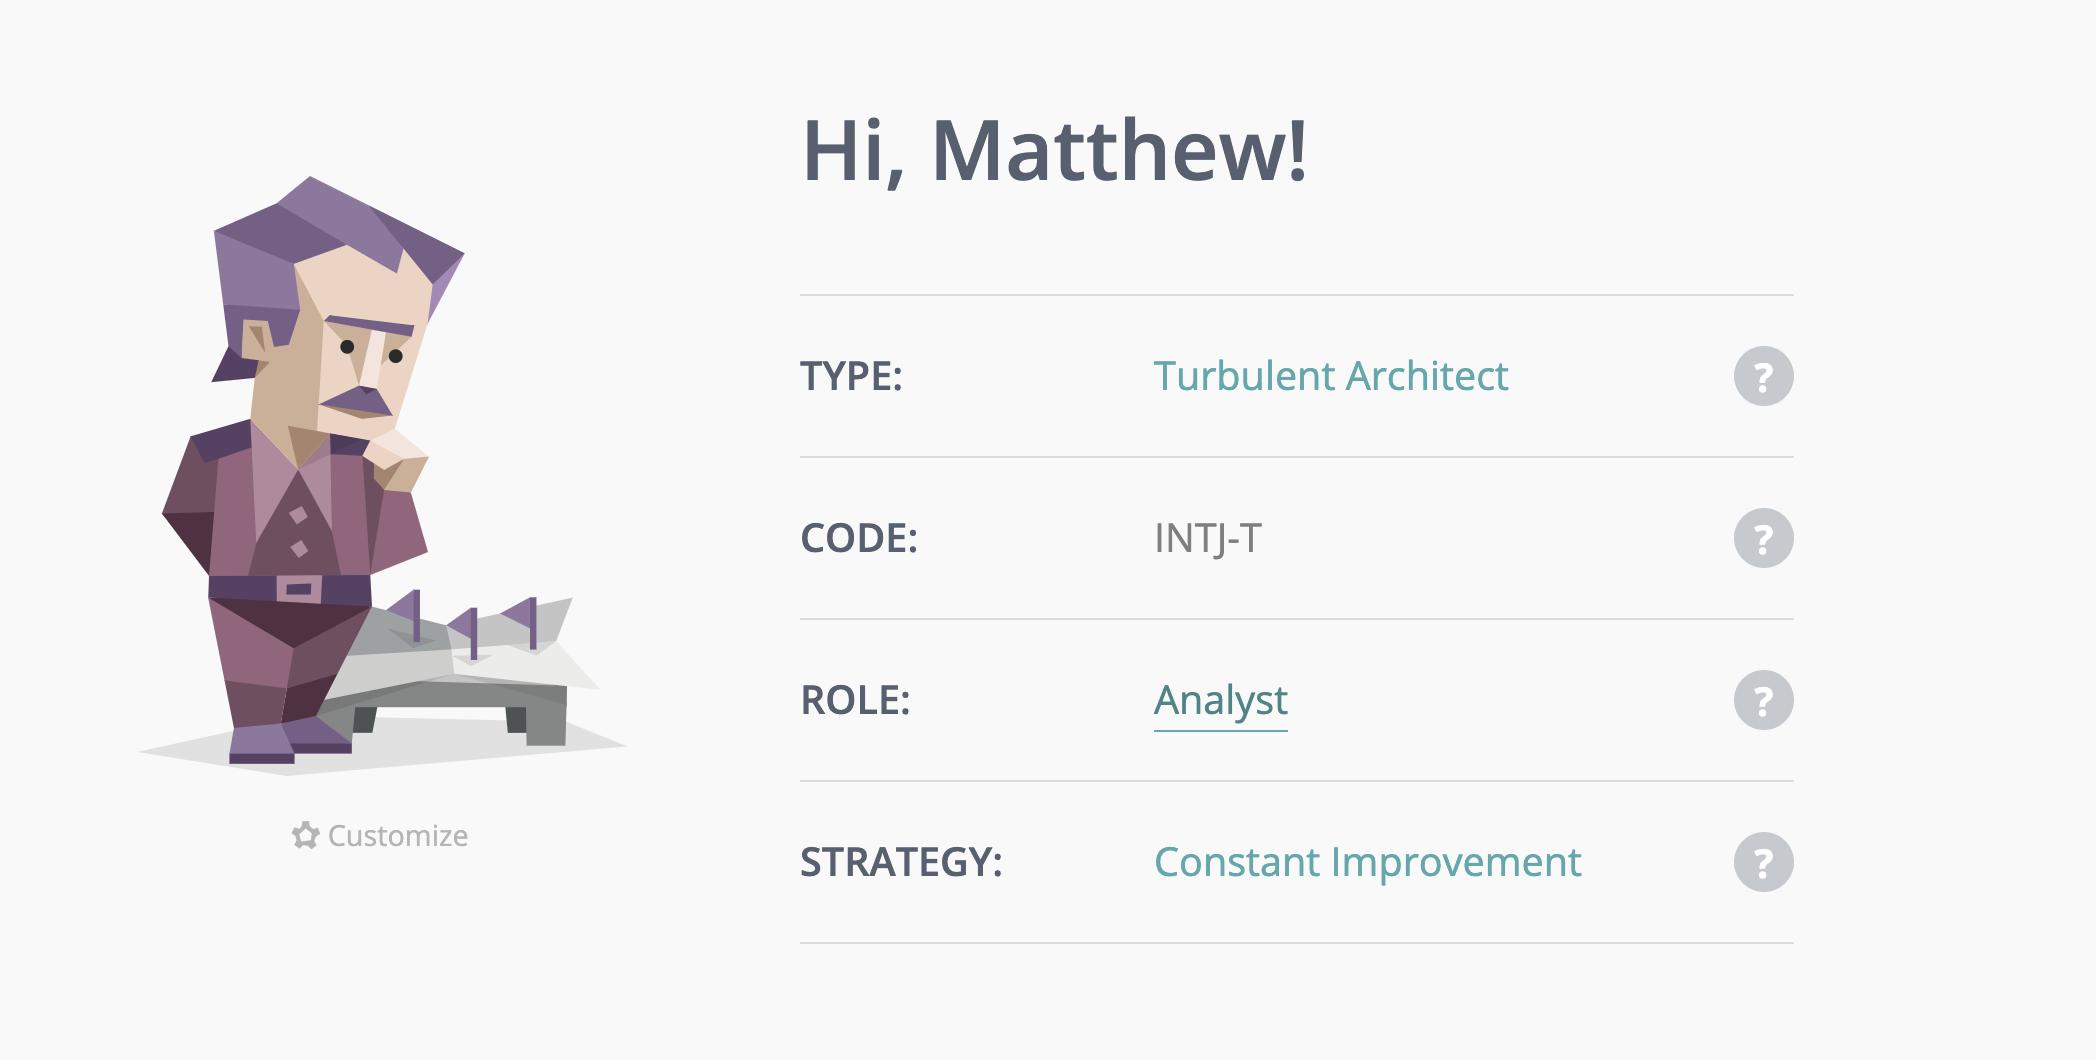 My Personality profile: INTJ